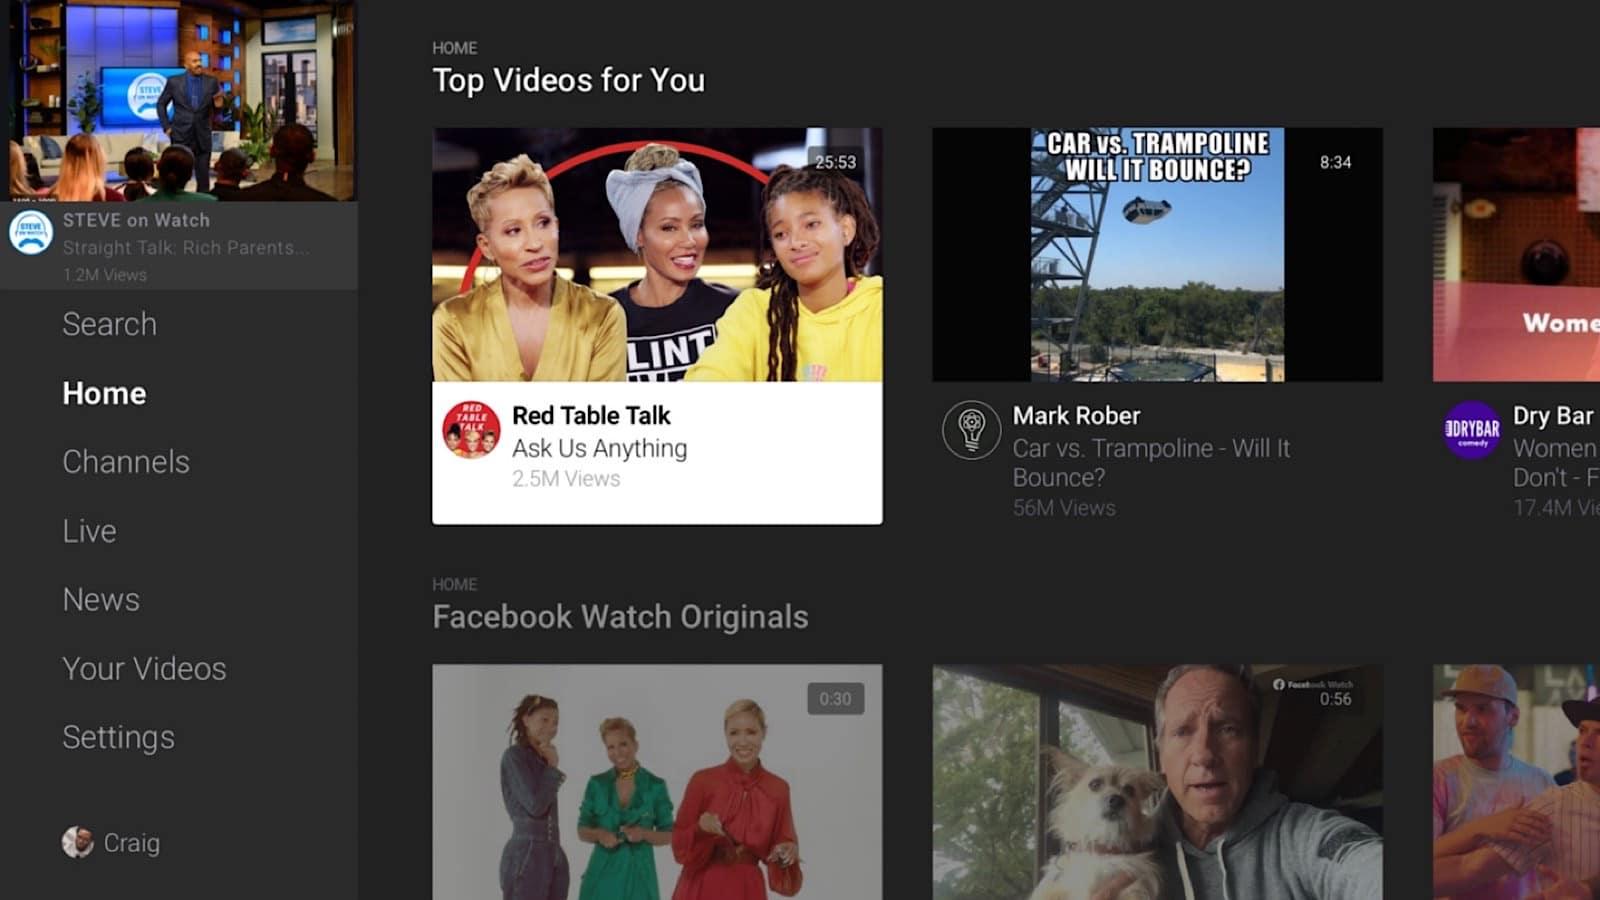 Facebook Watch on LG TVs